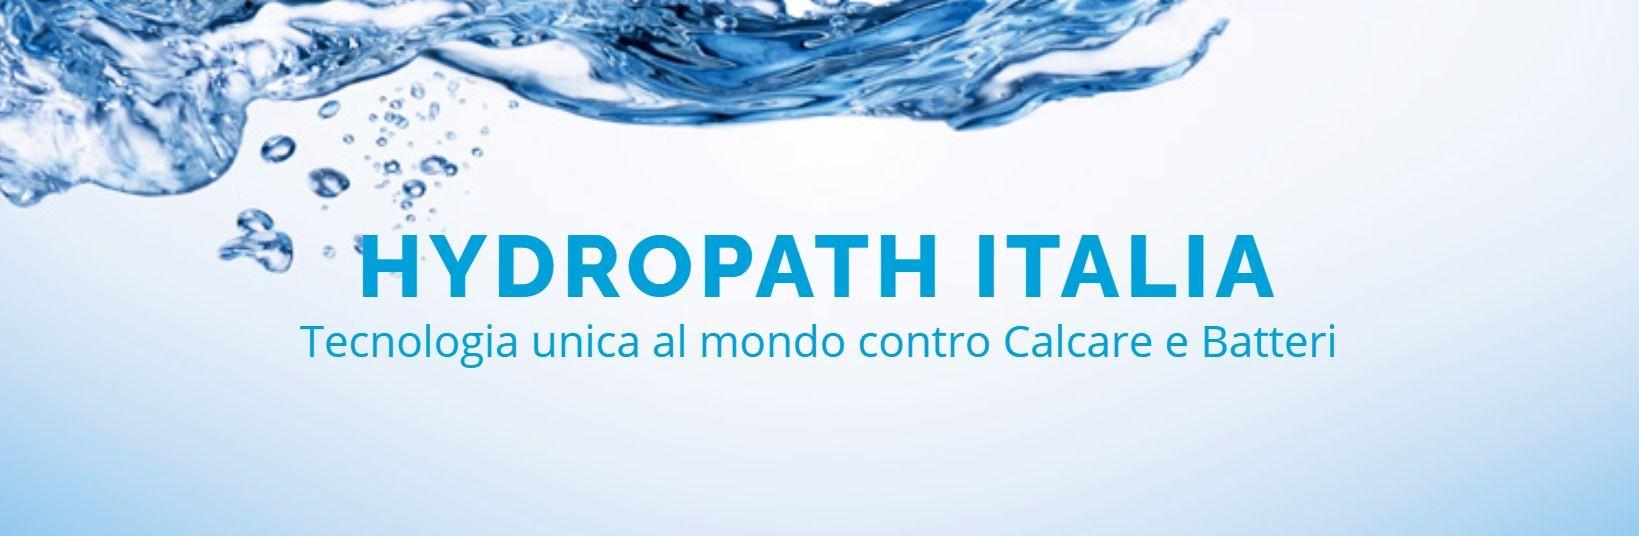 Hydropath-Italia